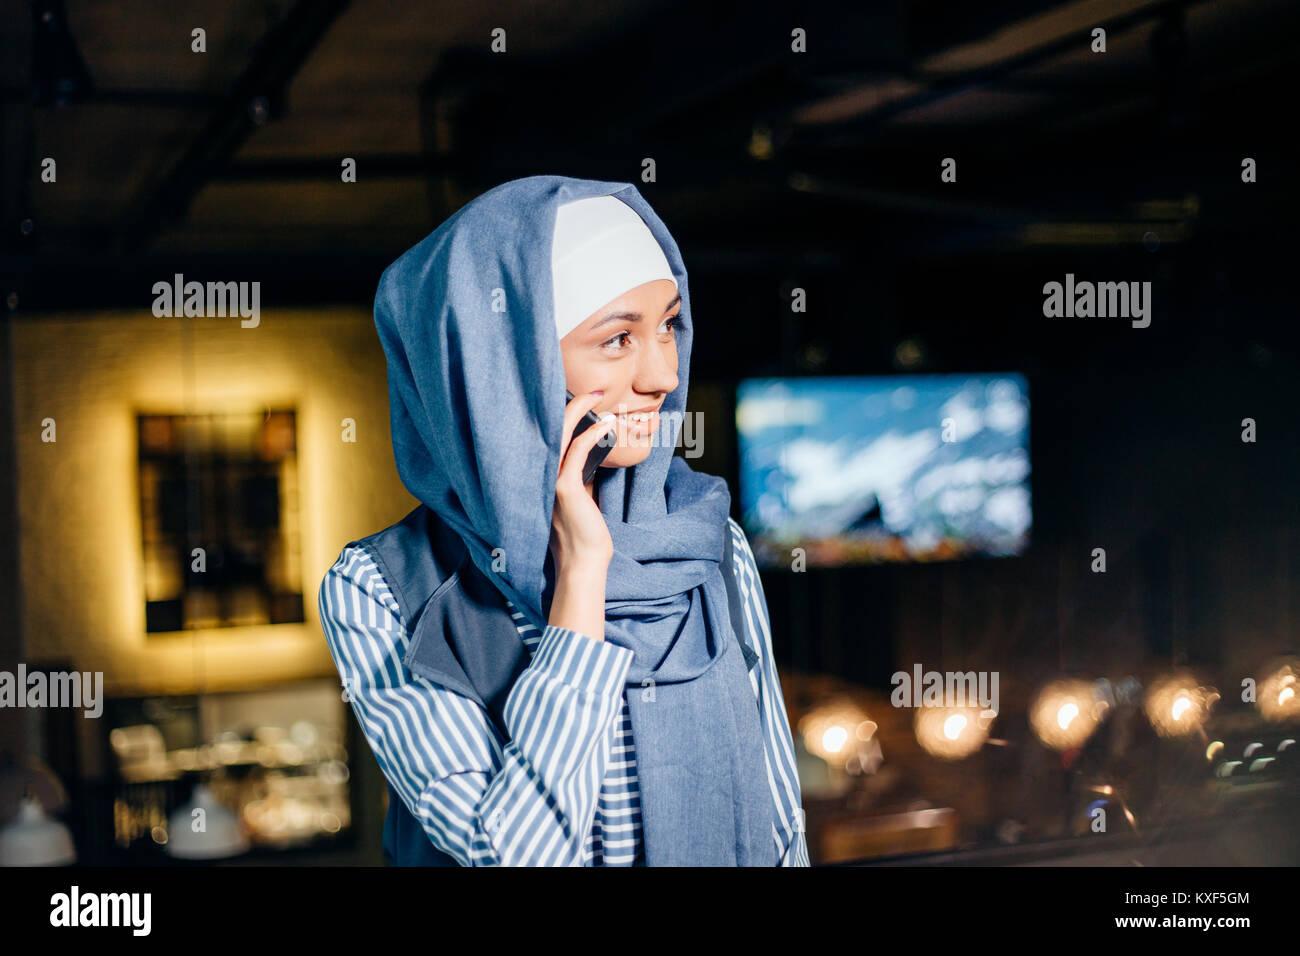 Muslim Woman On Break Using Mobile Phone In cafe - Stock Image